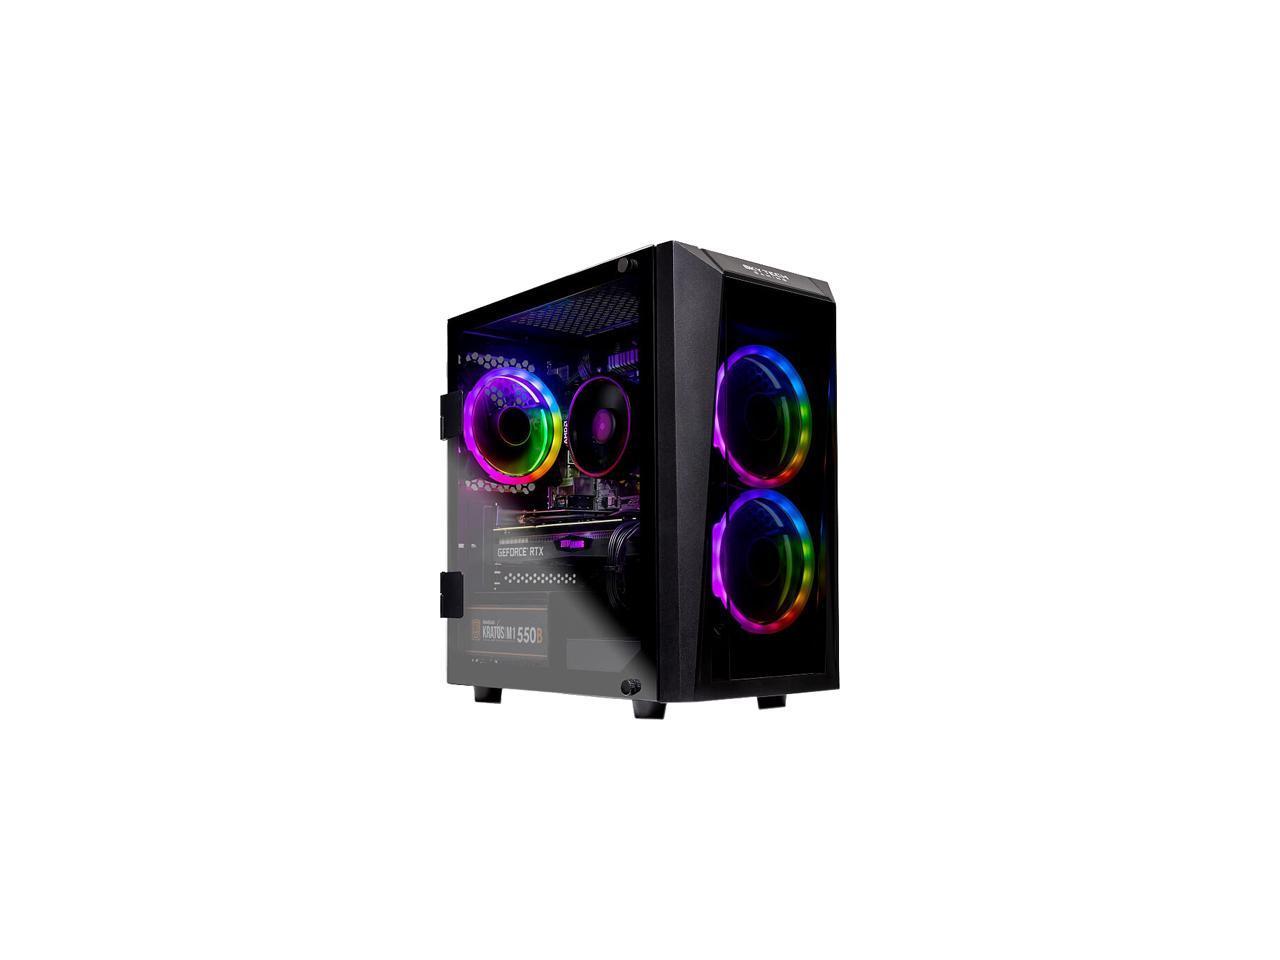 kyTech - Gaming Desktop PC - AMD Ryzen 5 3600 (6-Core 3.6 GHz), NVIDIA GeForce RTX 2070 SUPER (8 GB), 16 GB DDR4, 500 GB SSD, AMD B450, Windows 10 Home 64-bit, Blaze II $1050